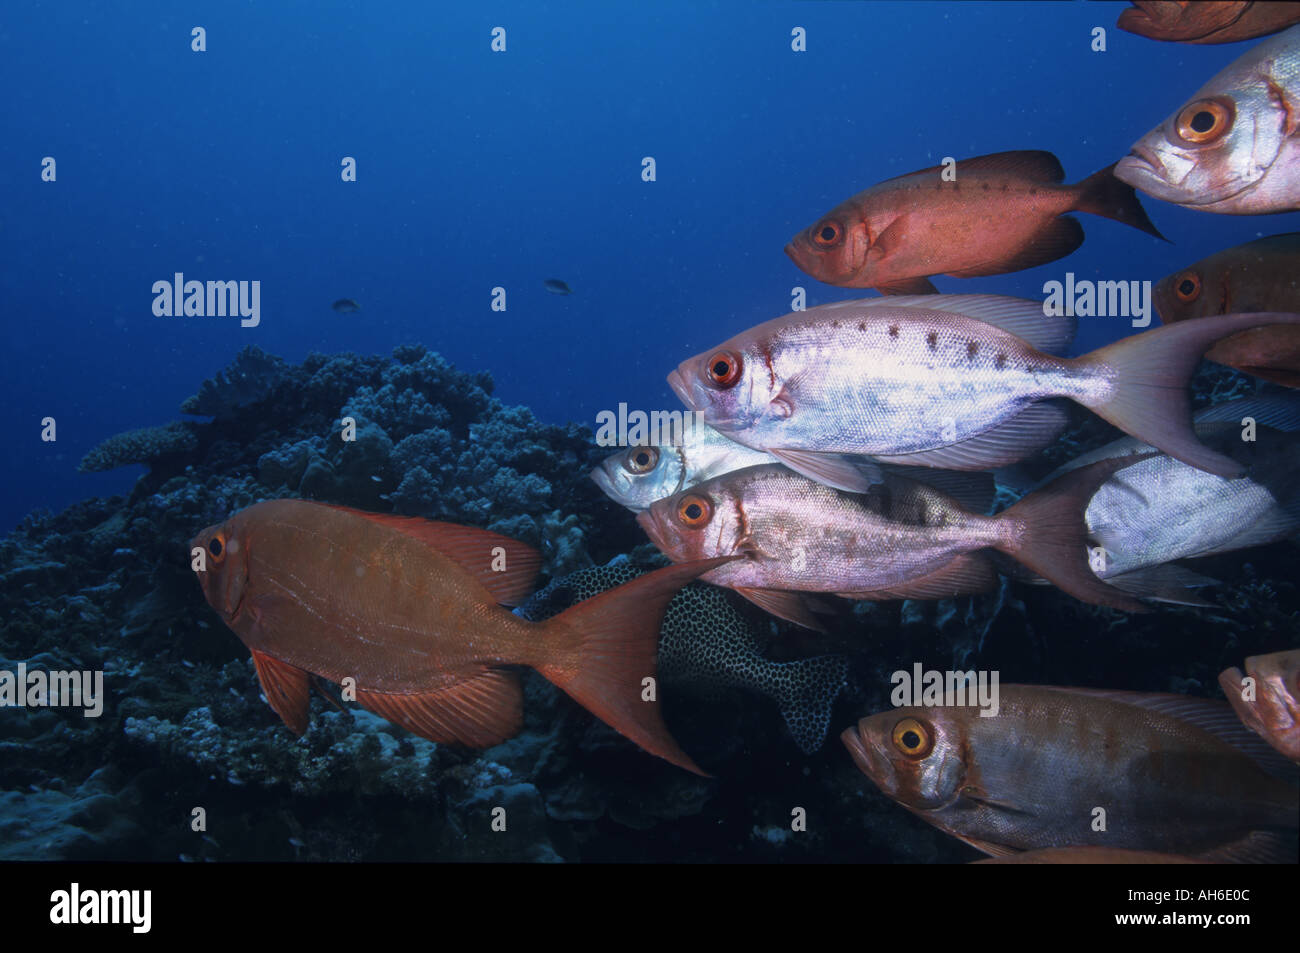 School of Blotcheye Soldierfish (Myripristis Berndti) and Redcoat Squirrelfish (Sargocentron rubrum), Noumea, New Caledonia - Stock Image